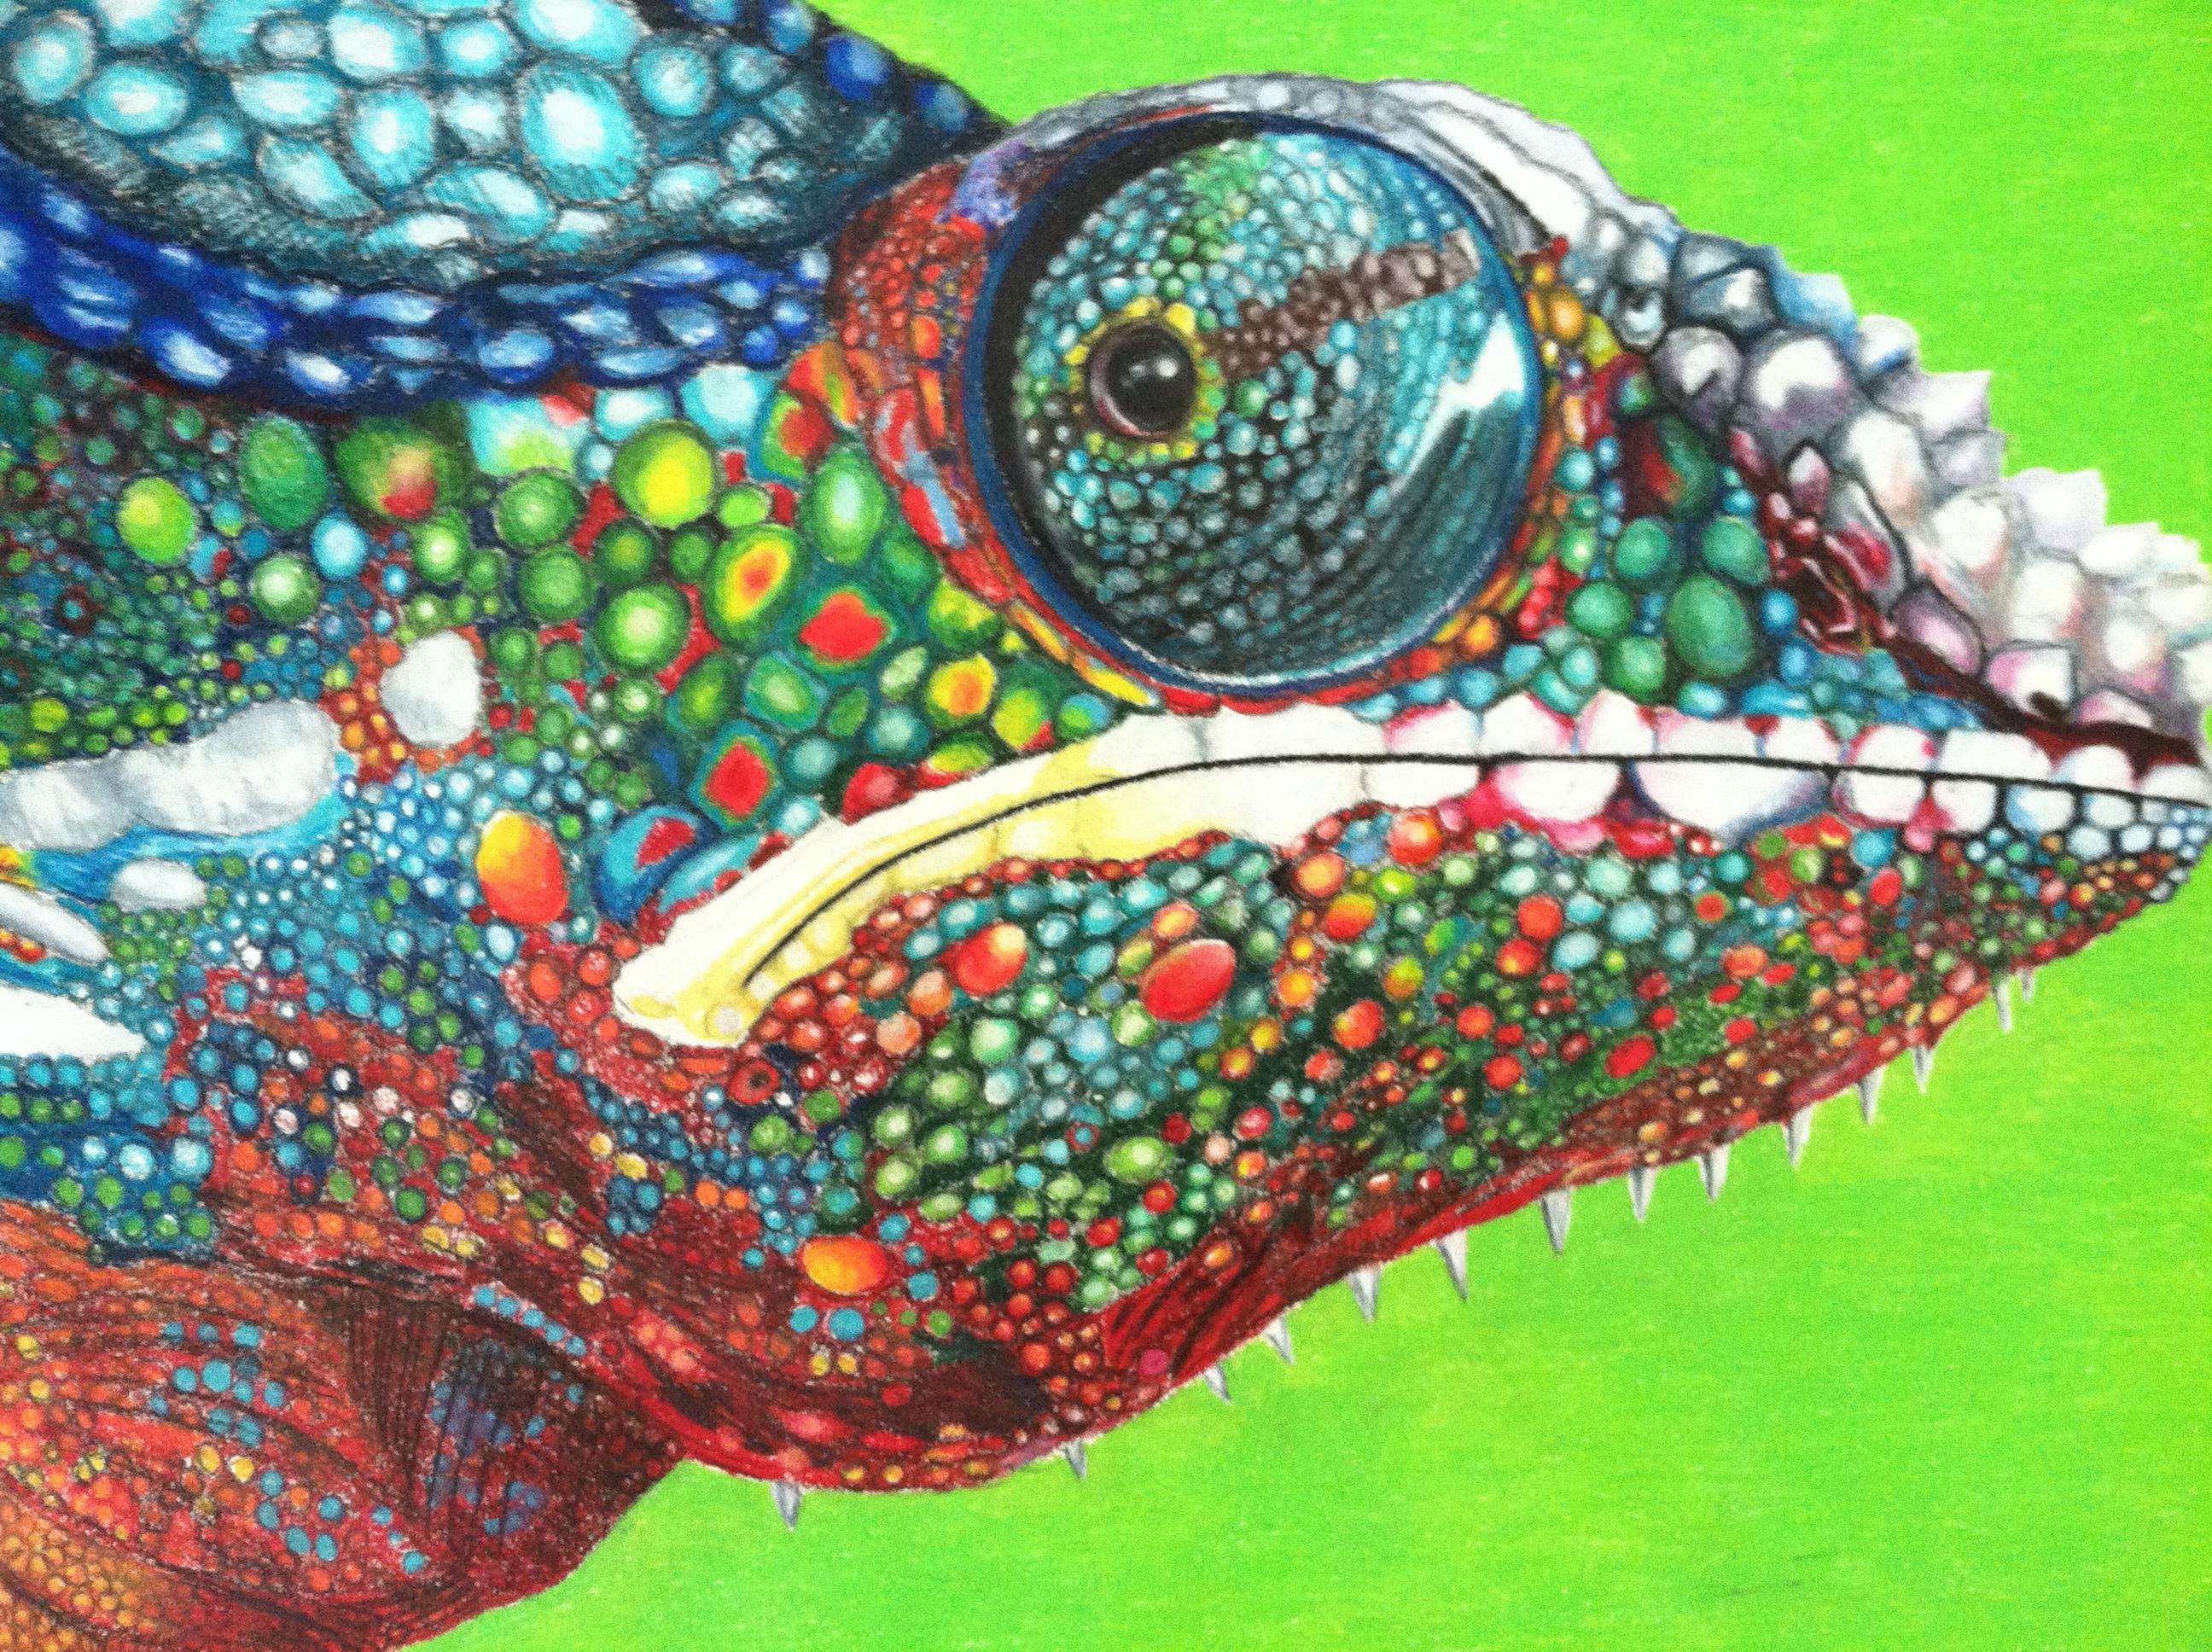 Colorful Chameleon by Wajanja on DeviantArt